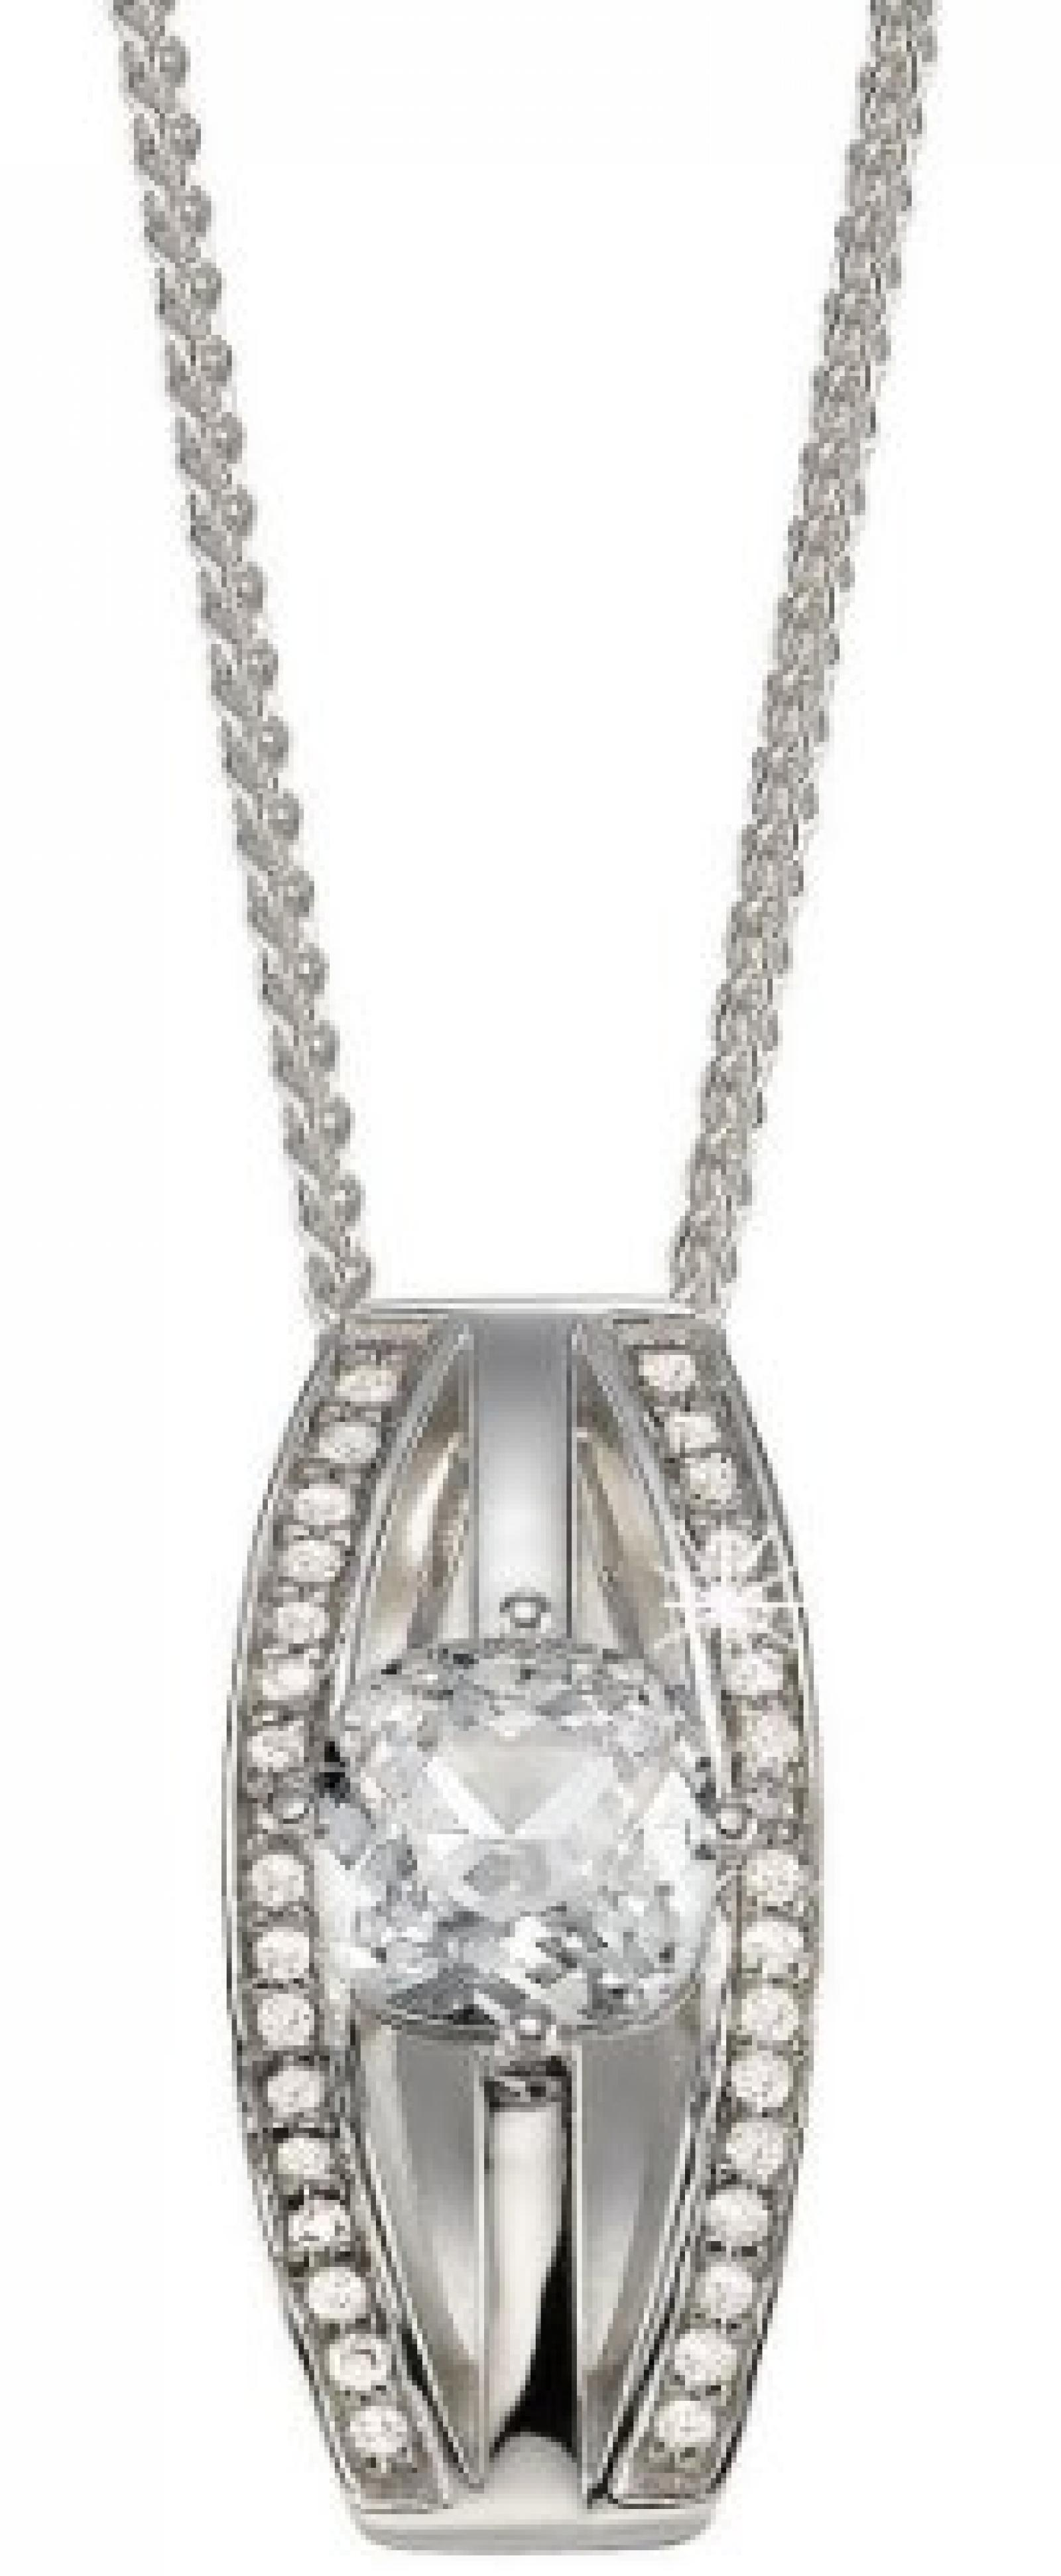 Pierre Cardin Damen Halskette 925 Sterling Silber rhodiniert Kristall Zirkonia Extase 42 cm weiß PCNL90403A420